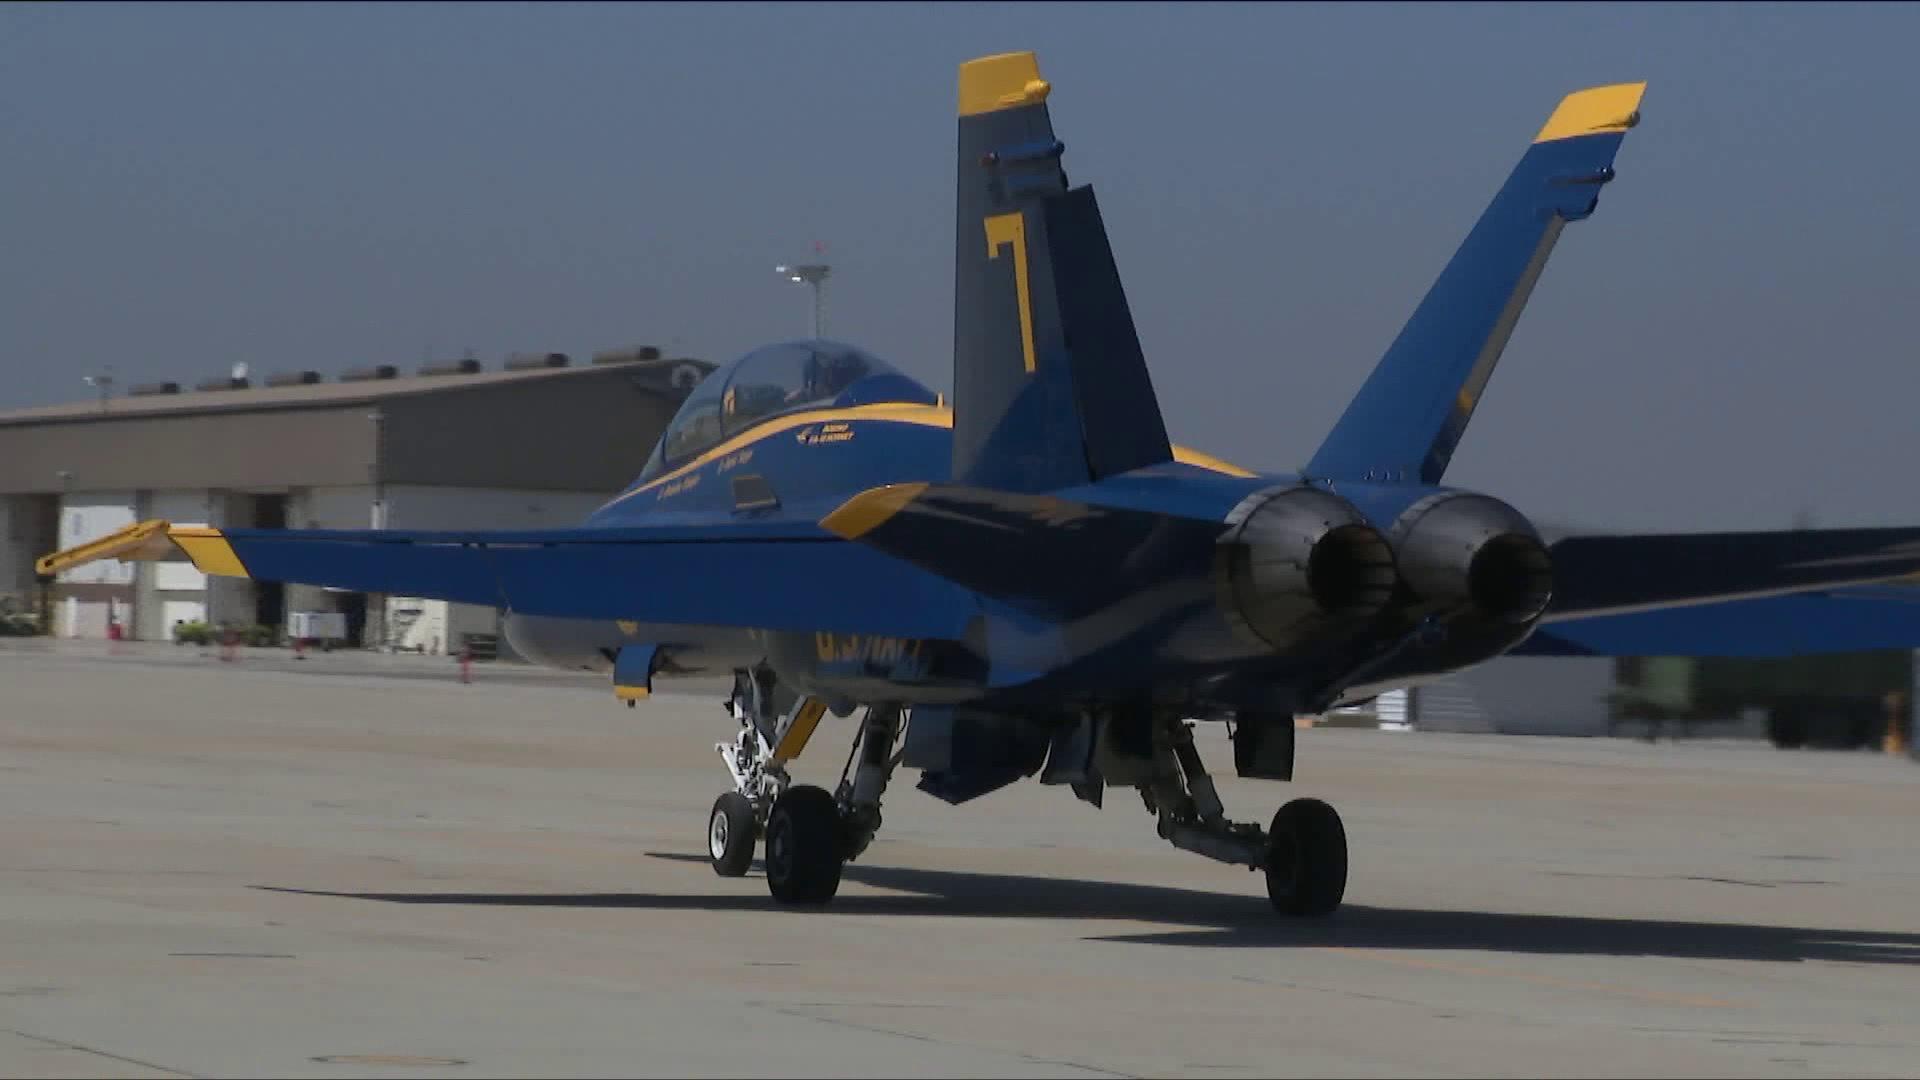 A Blue Angels F-18 fighter is shown at Los Alamitos training base on Sept. 27, 2017. (Credit: KTLA)